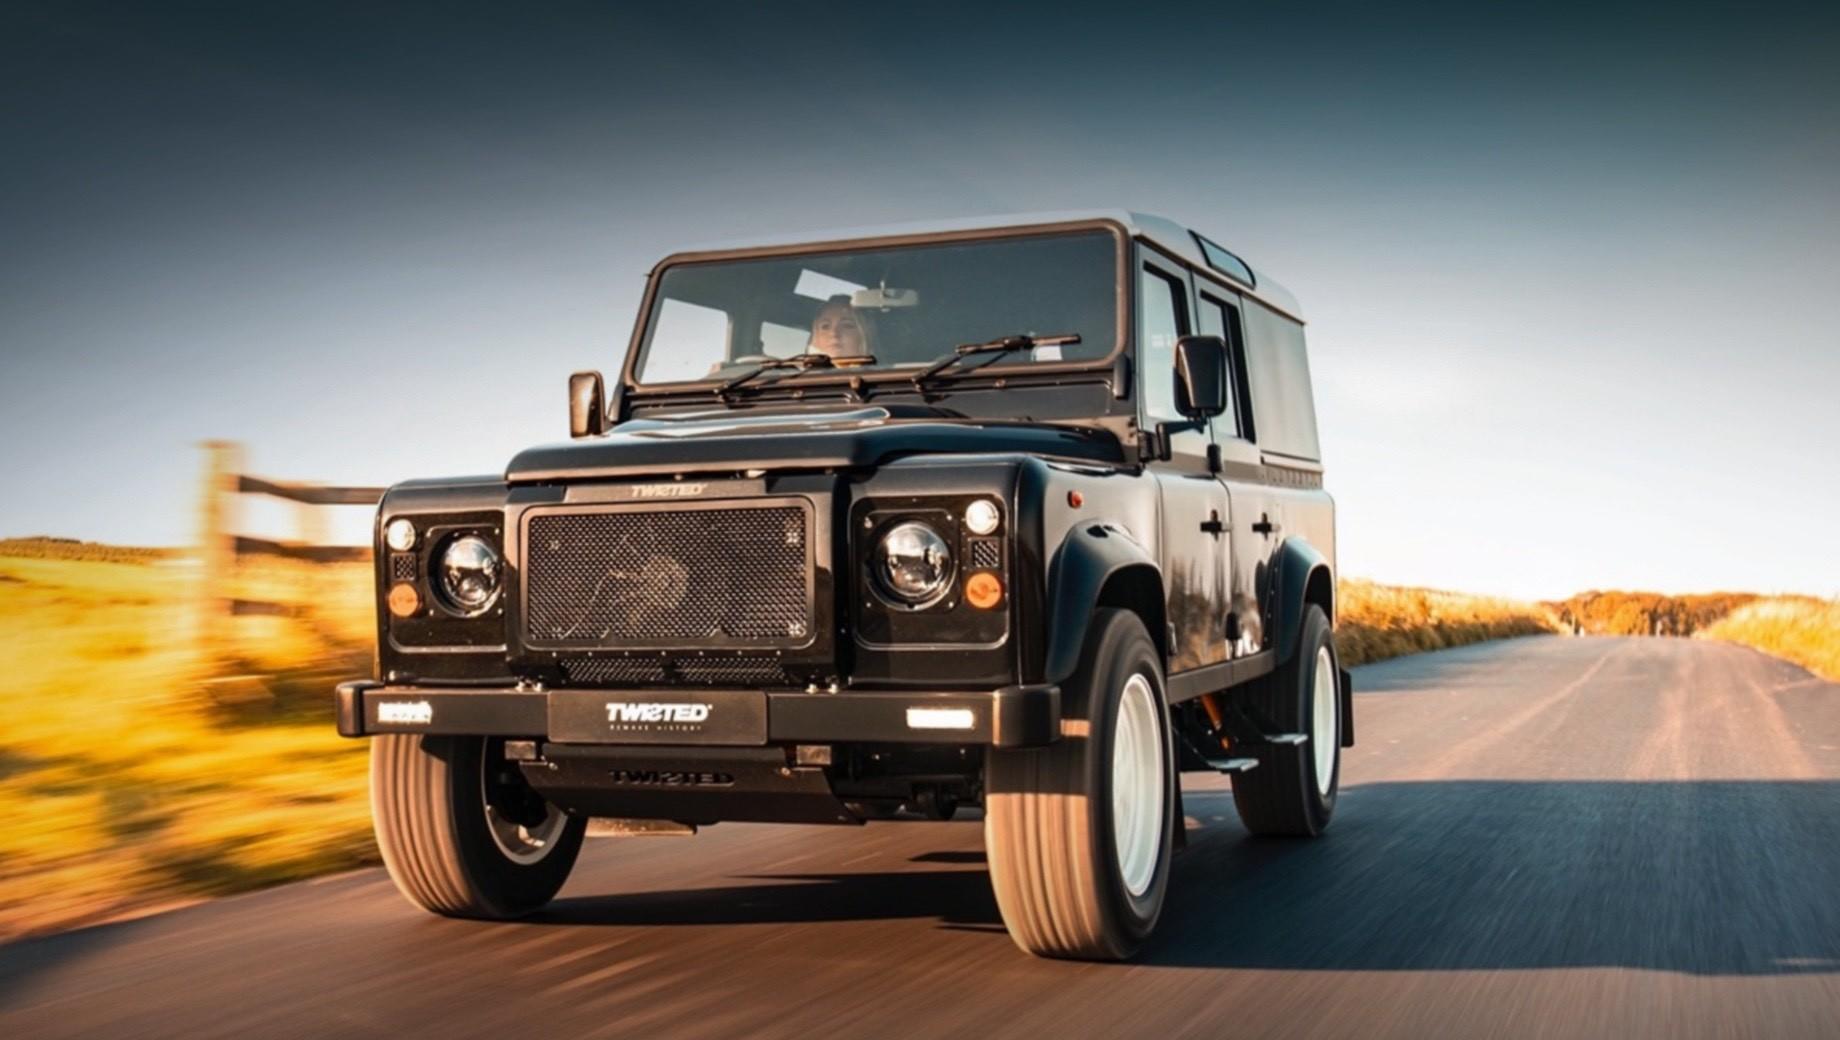 Ателье Twisted приучило к розетке классический Land Rover Defender